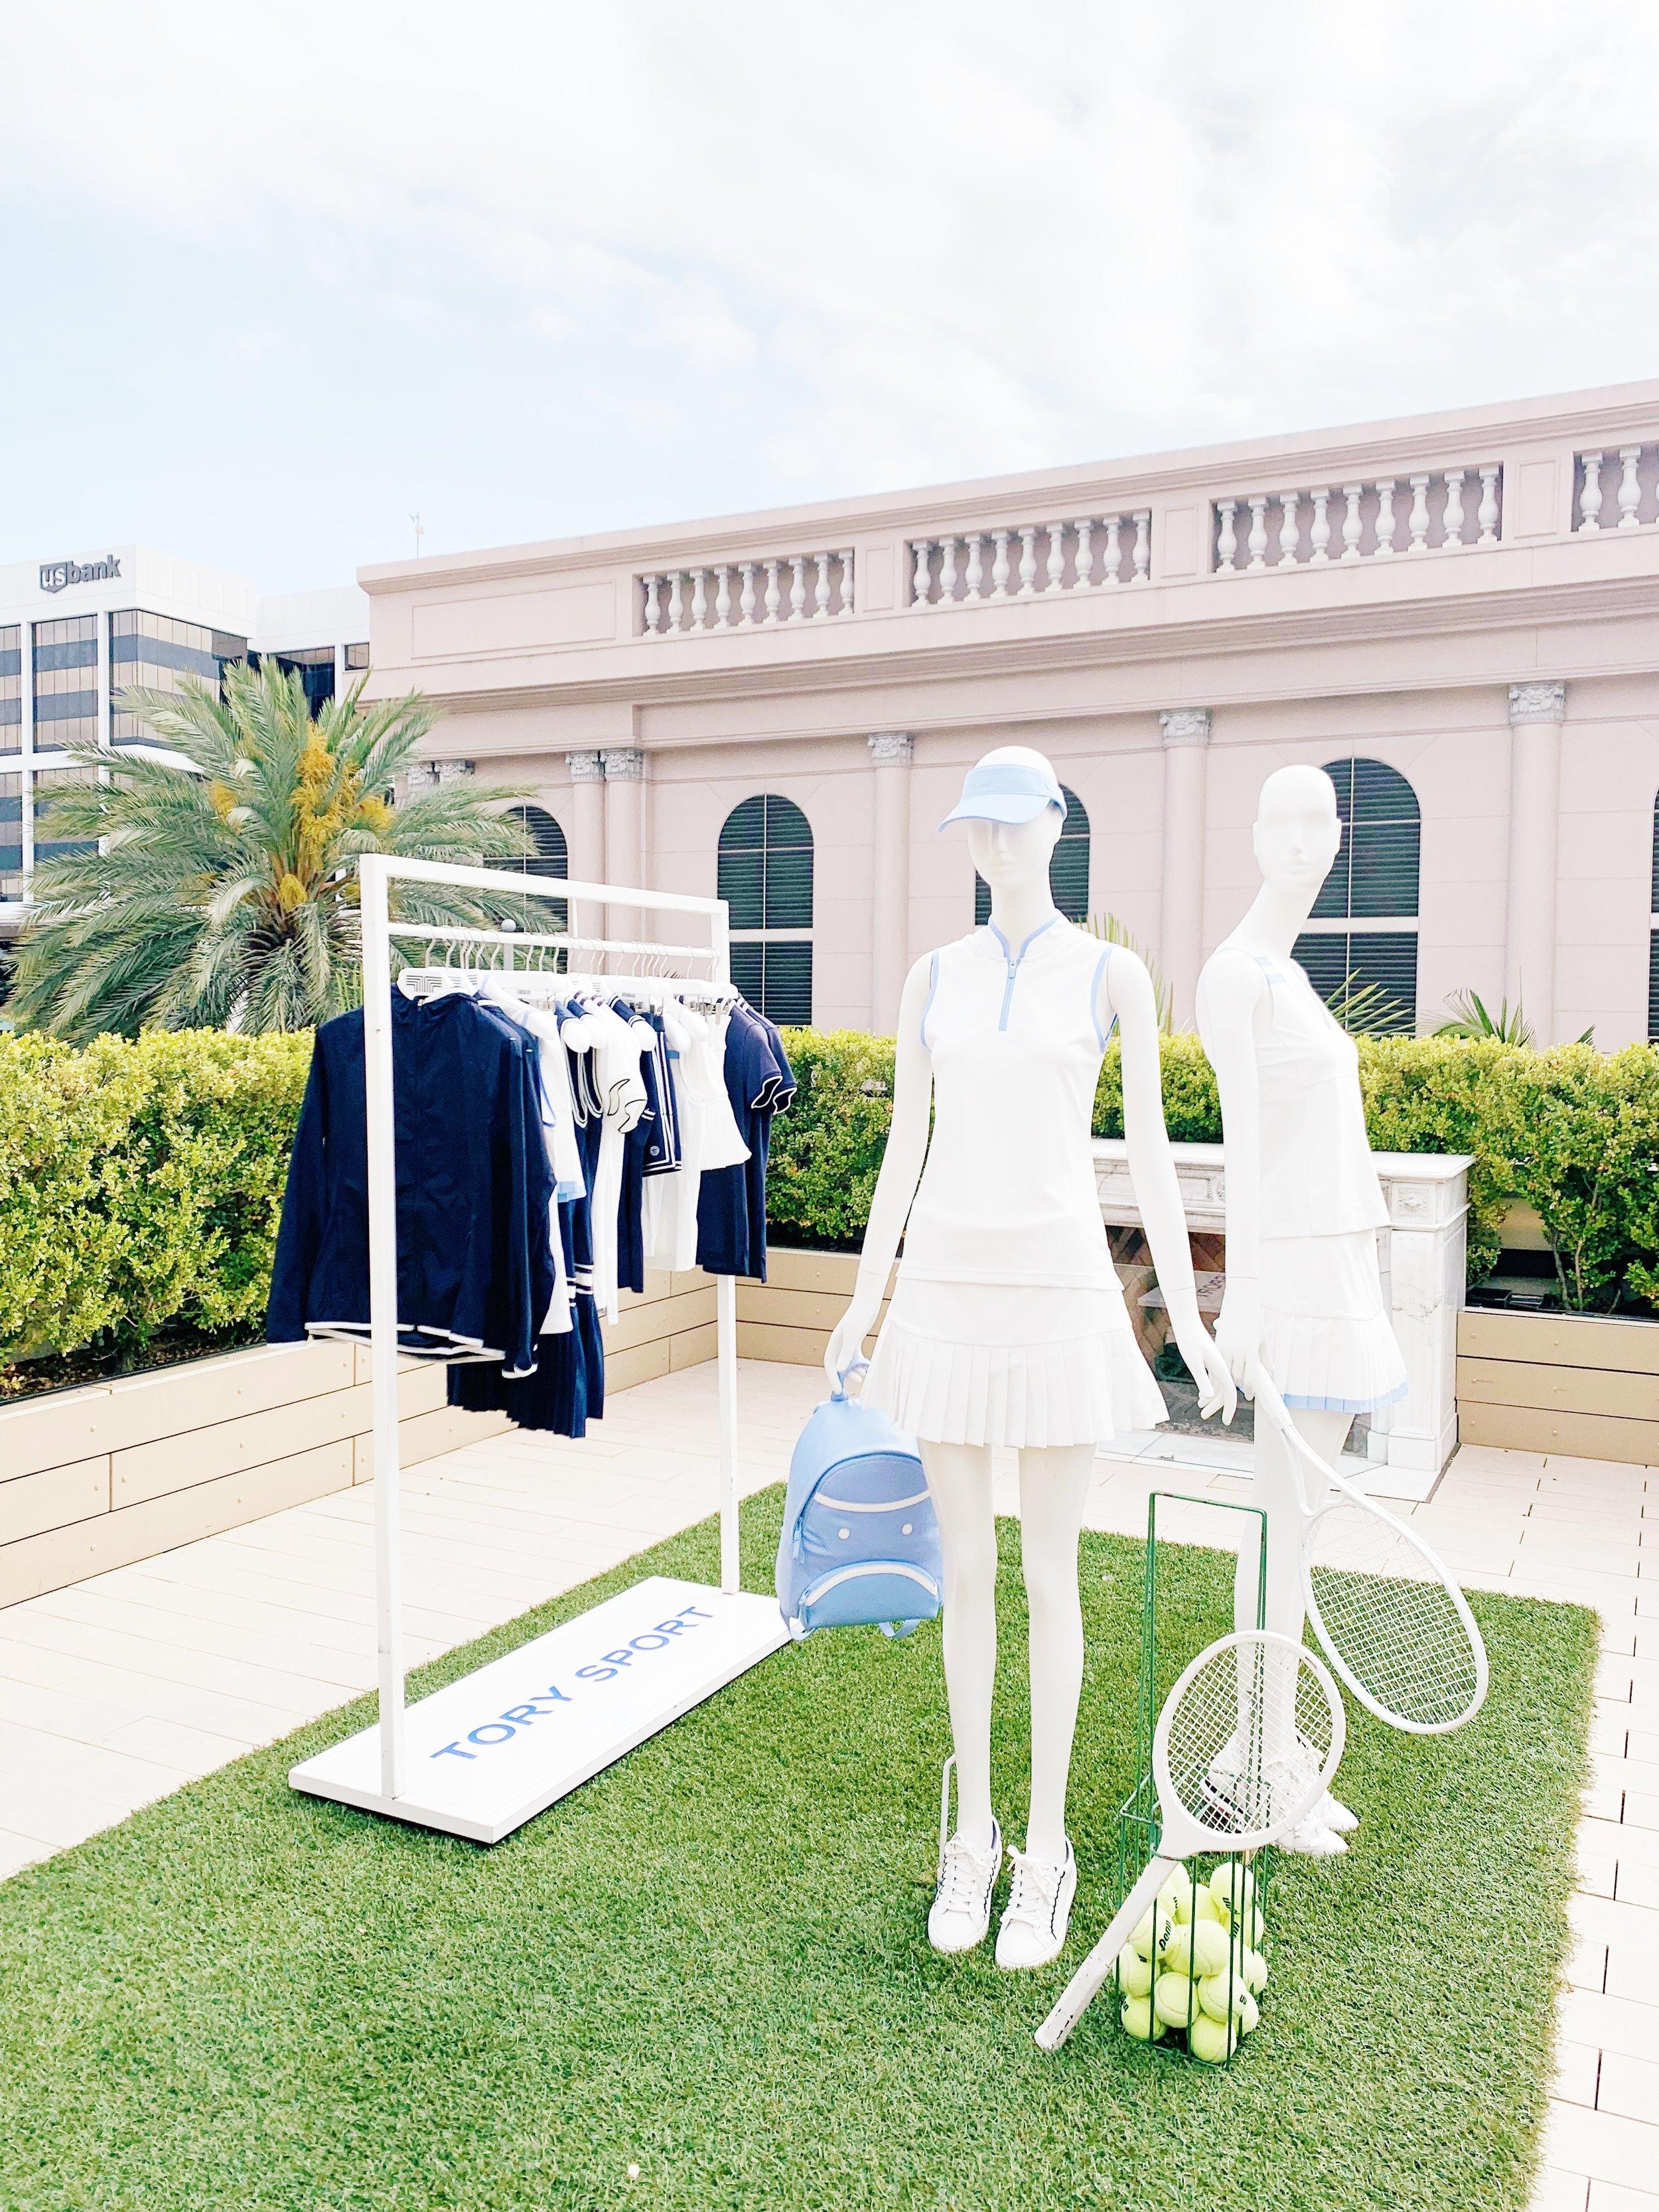 lcb style fashion blogger los angeles8.JPG